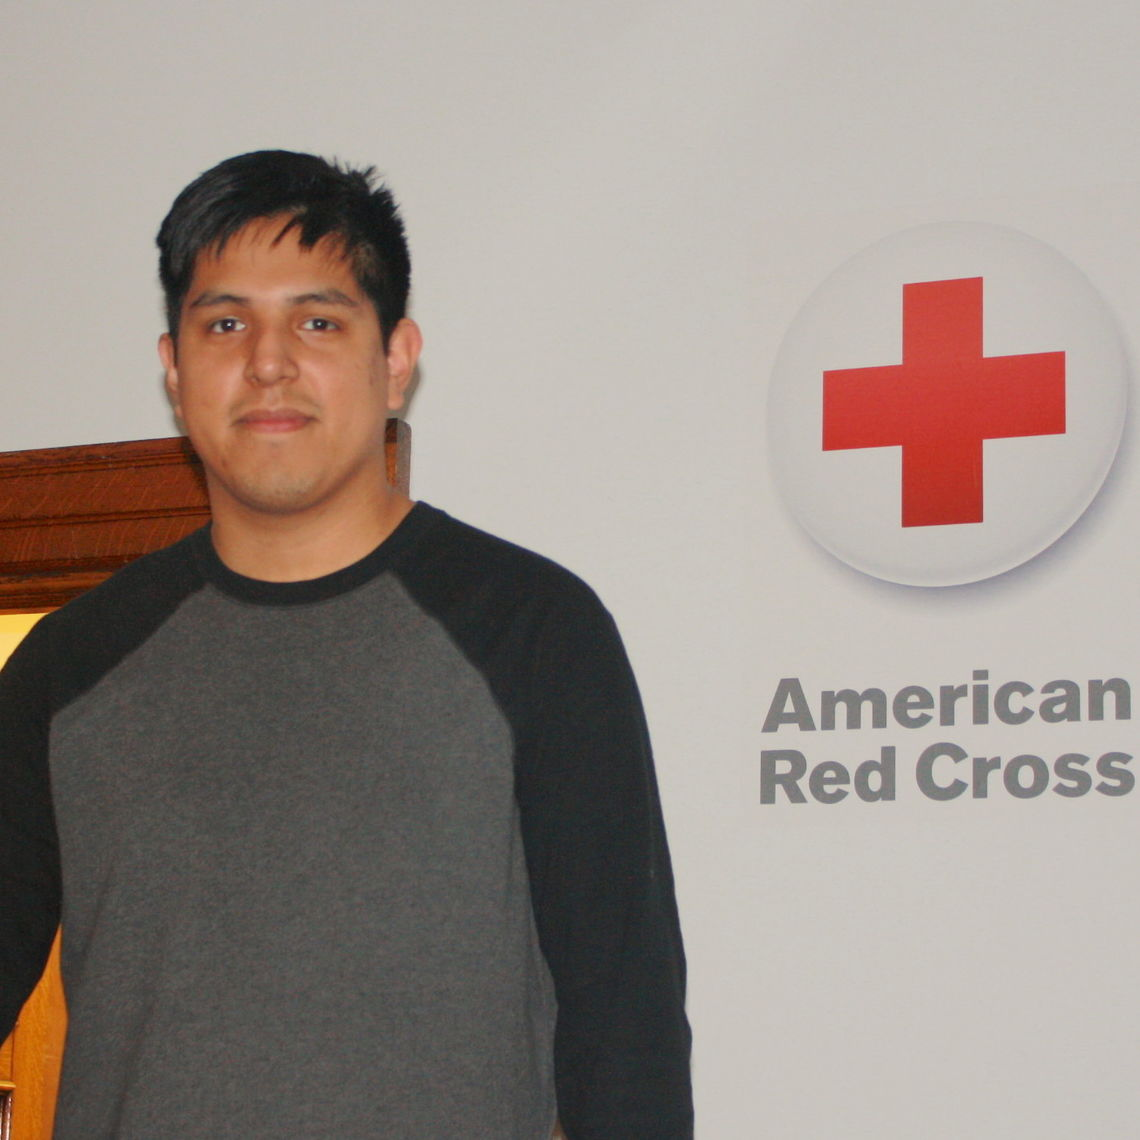 15 F&M Works C Bruno red cross